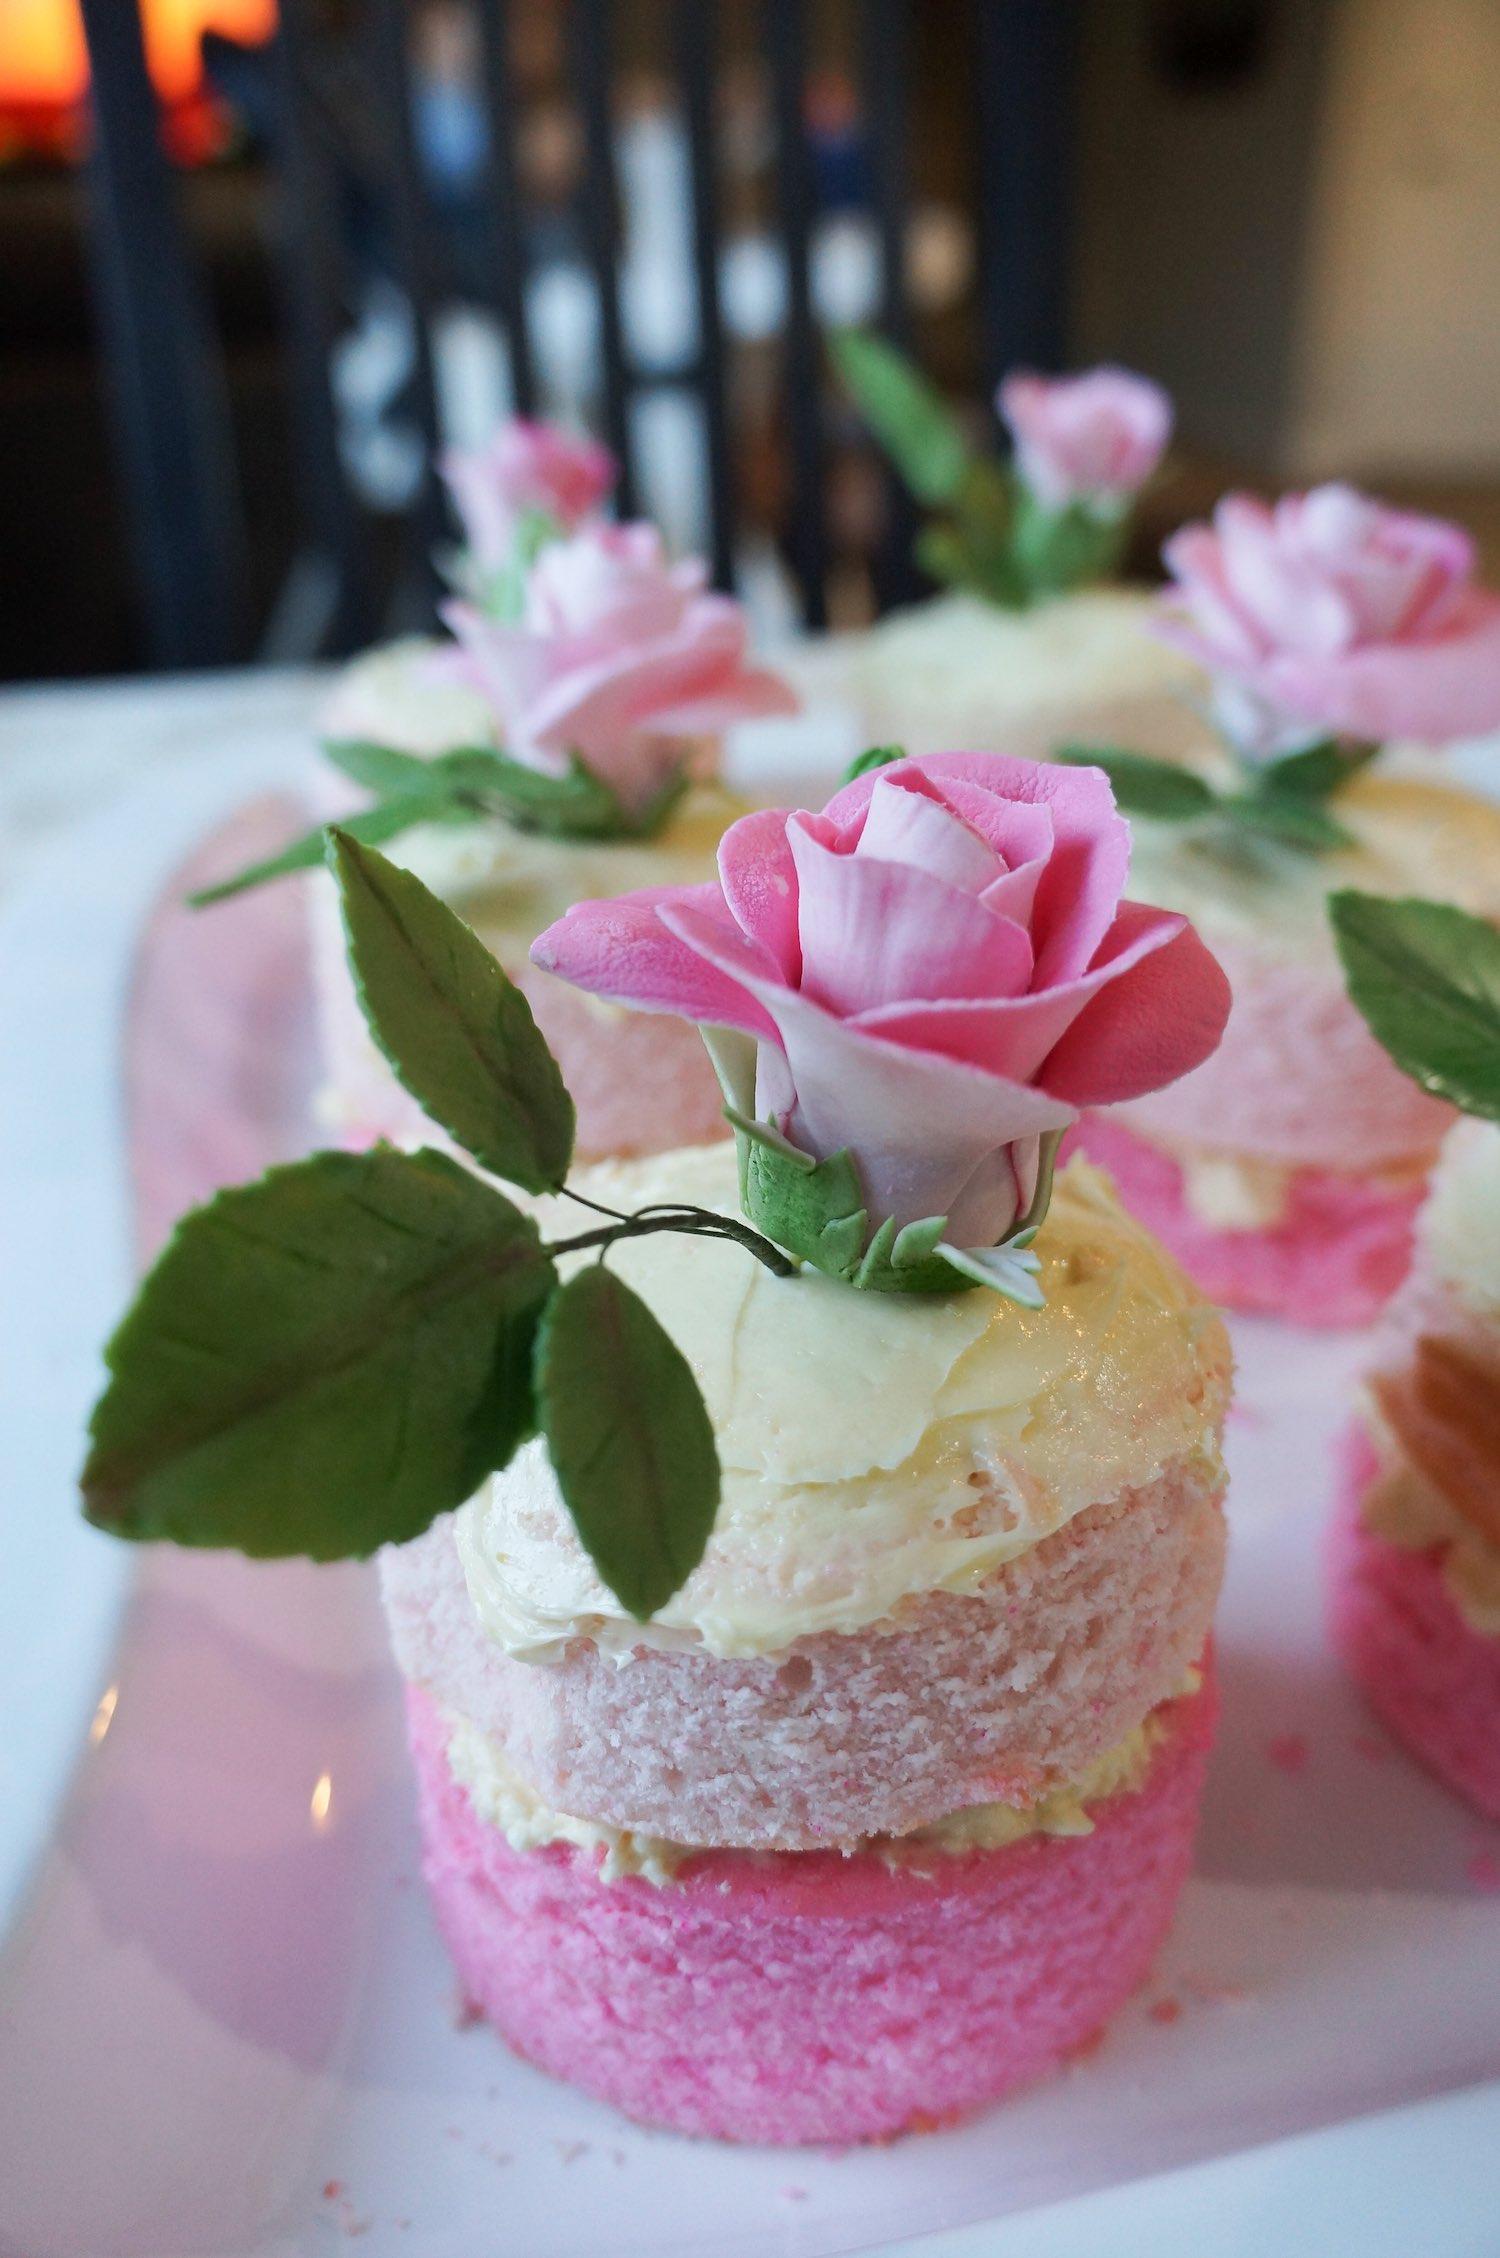 Edible Fresh Flowers Cake